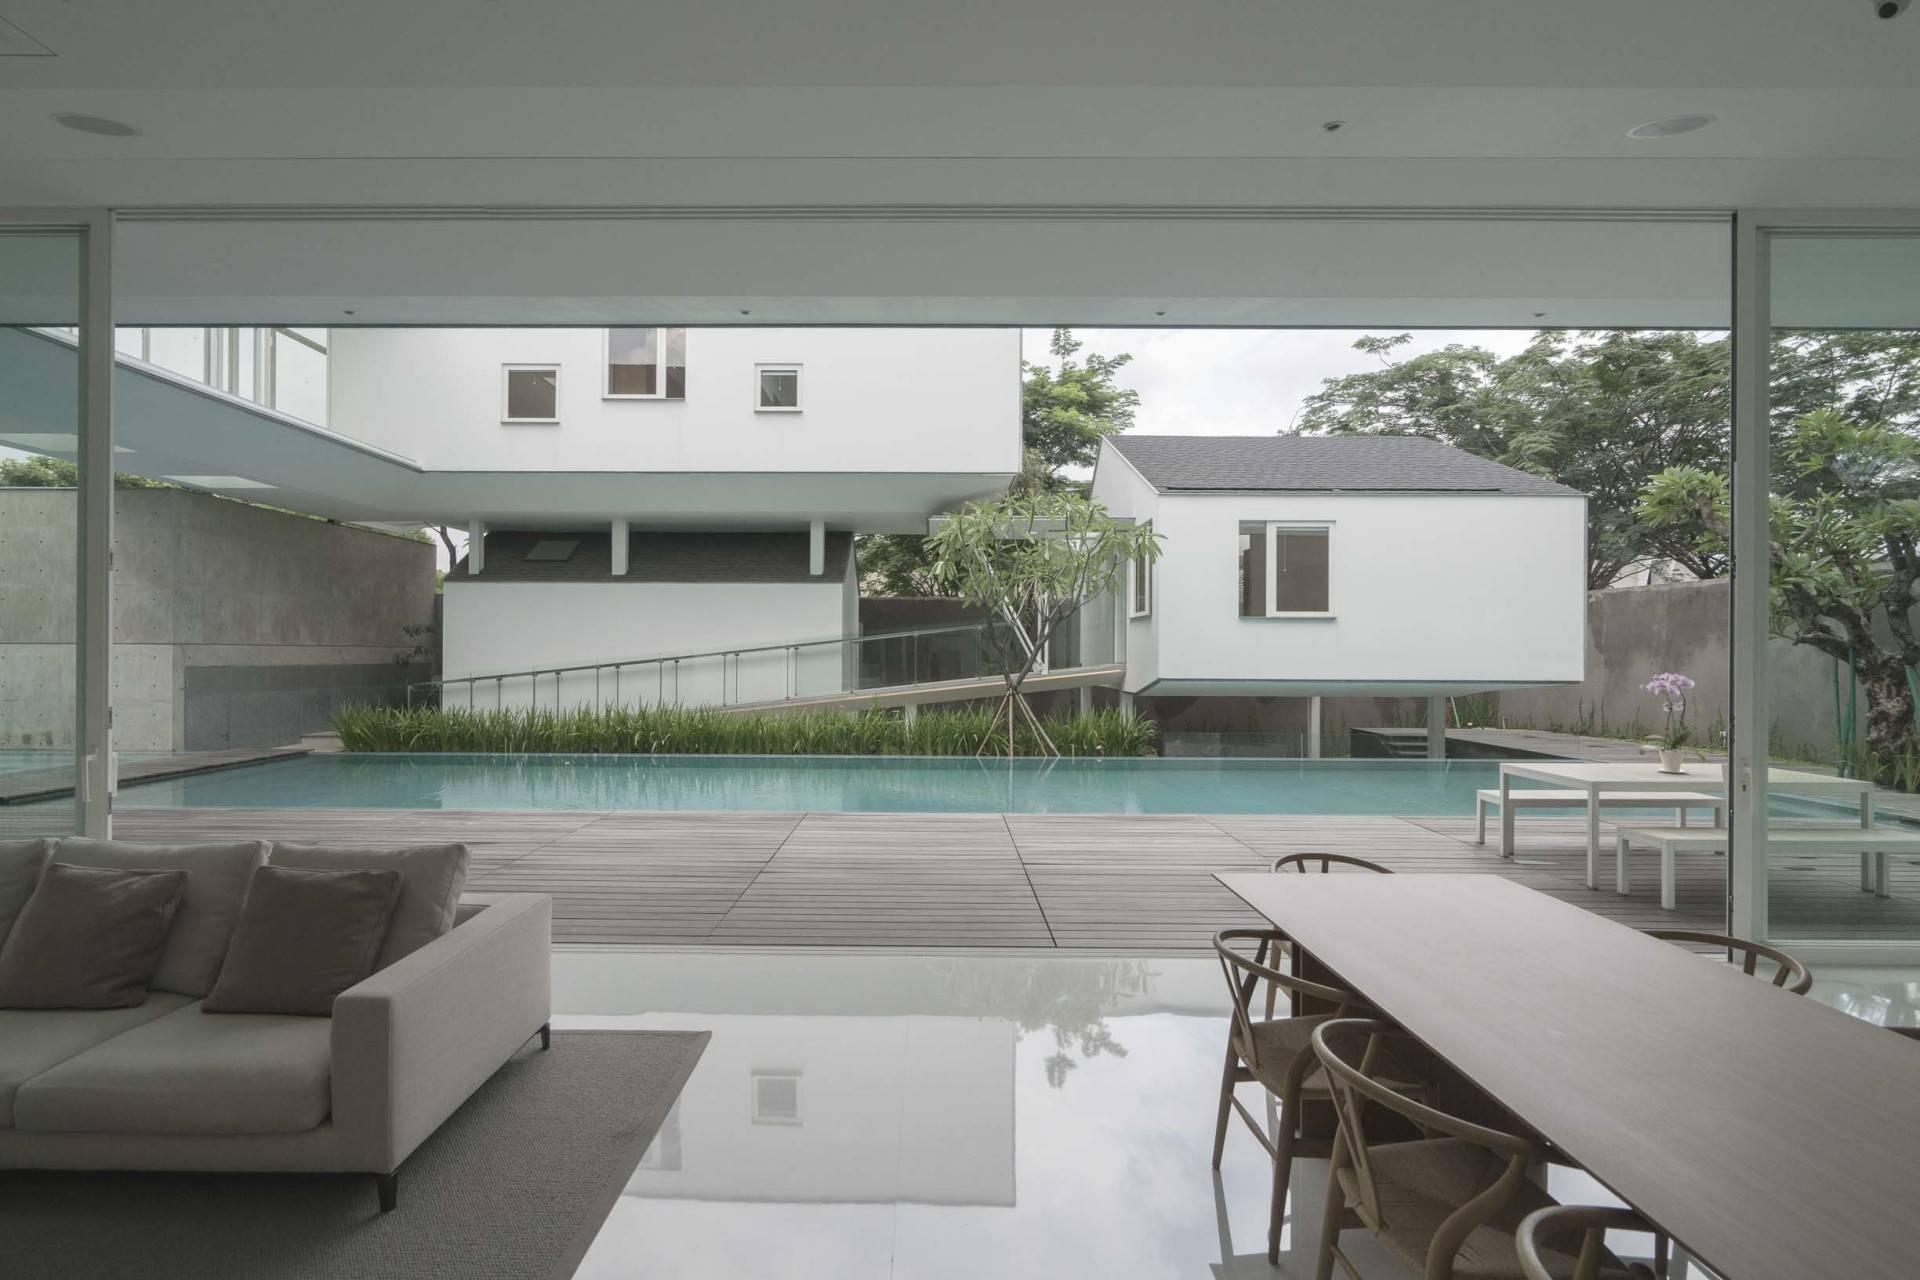 Antony Liu + Ferry Ridwan / Studio Tonton Is House Tangerang Tangerang Swimming Pool View Modern  8178